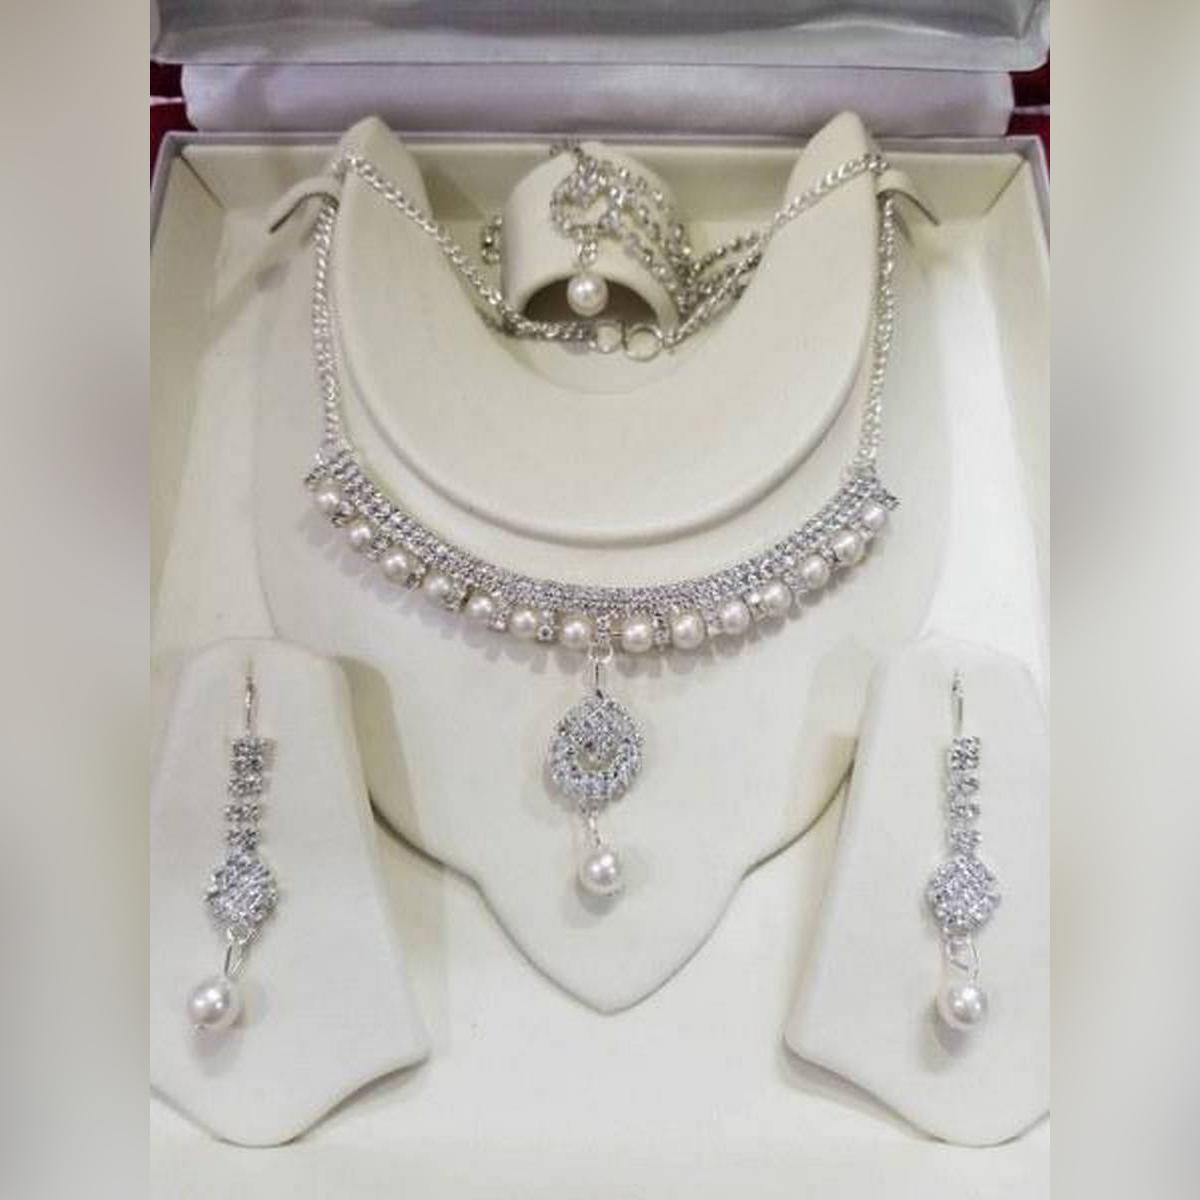 Silver Crystal Rhinstone Girls Necklace ,Earrings ,Jewellery Set Hot Fashion Trendy Style Party Wear, Bridal Wear , Fashion For Women